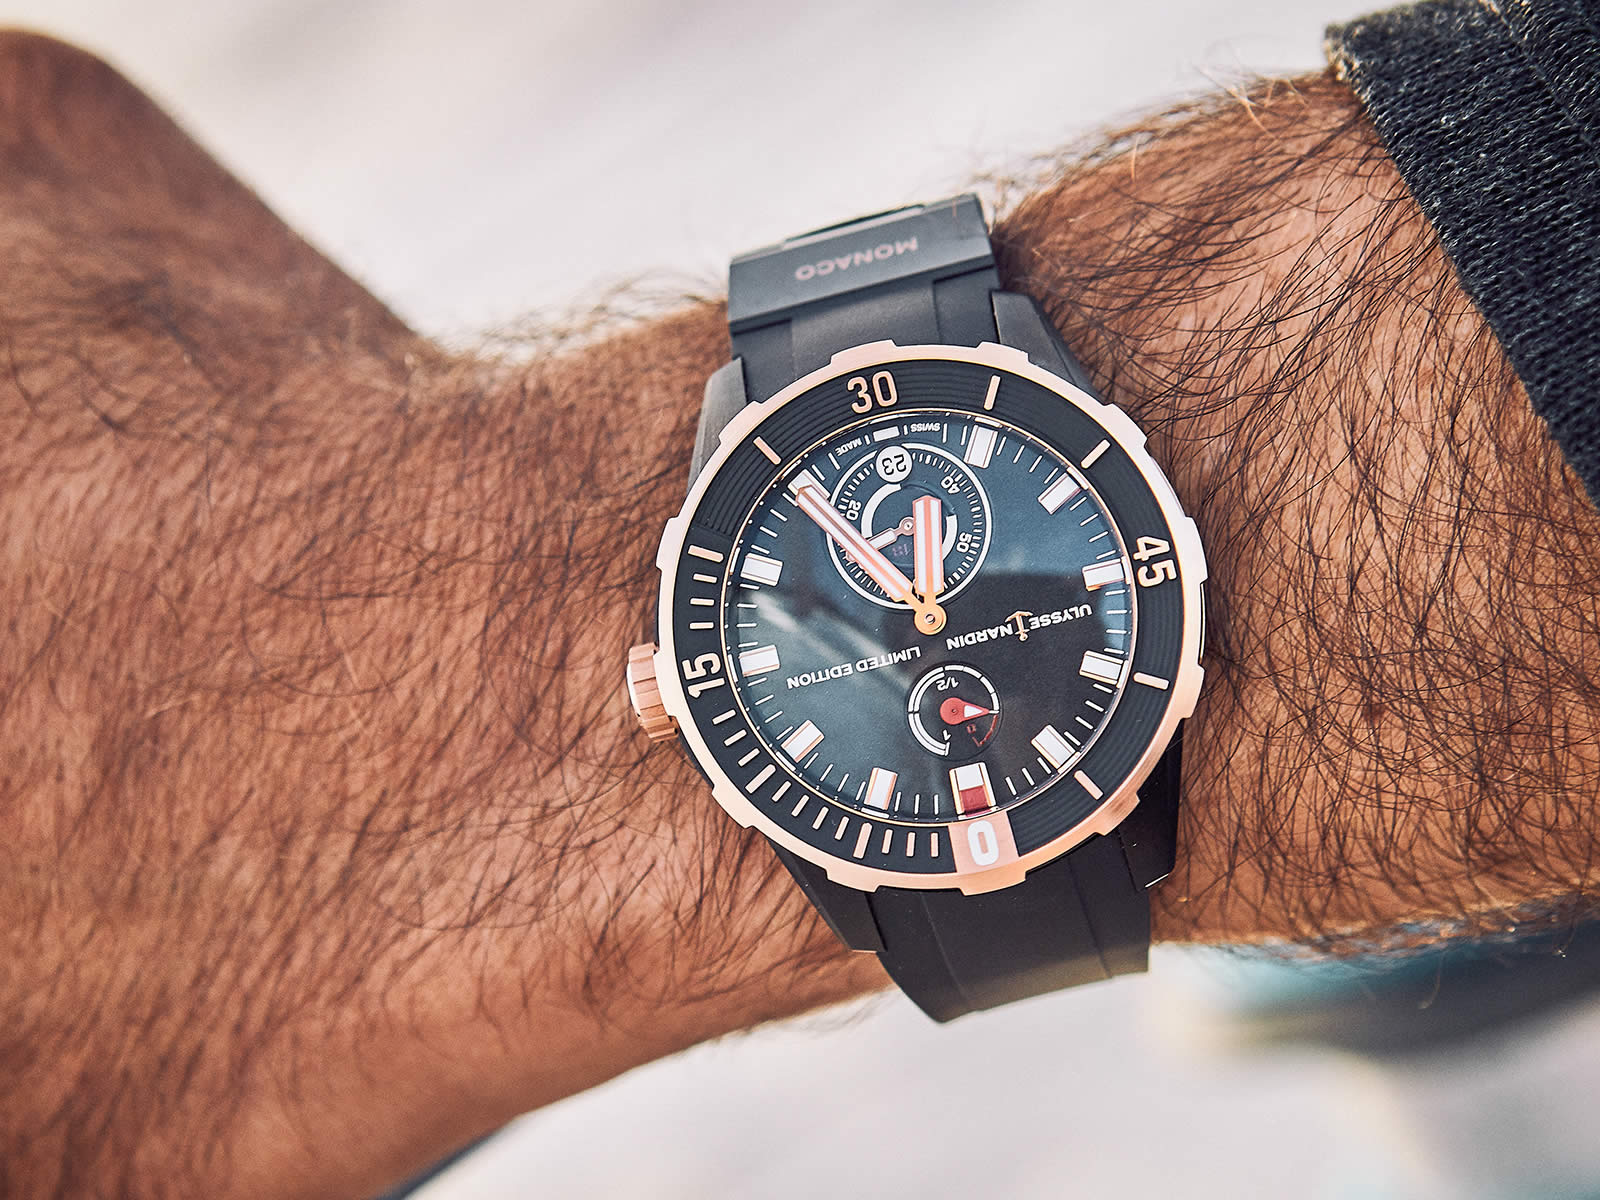 ulysse-nardin-diver-chronometer-2018-models-14-.jpg